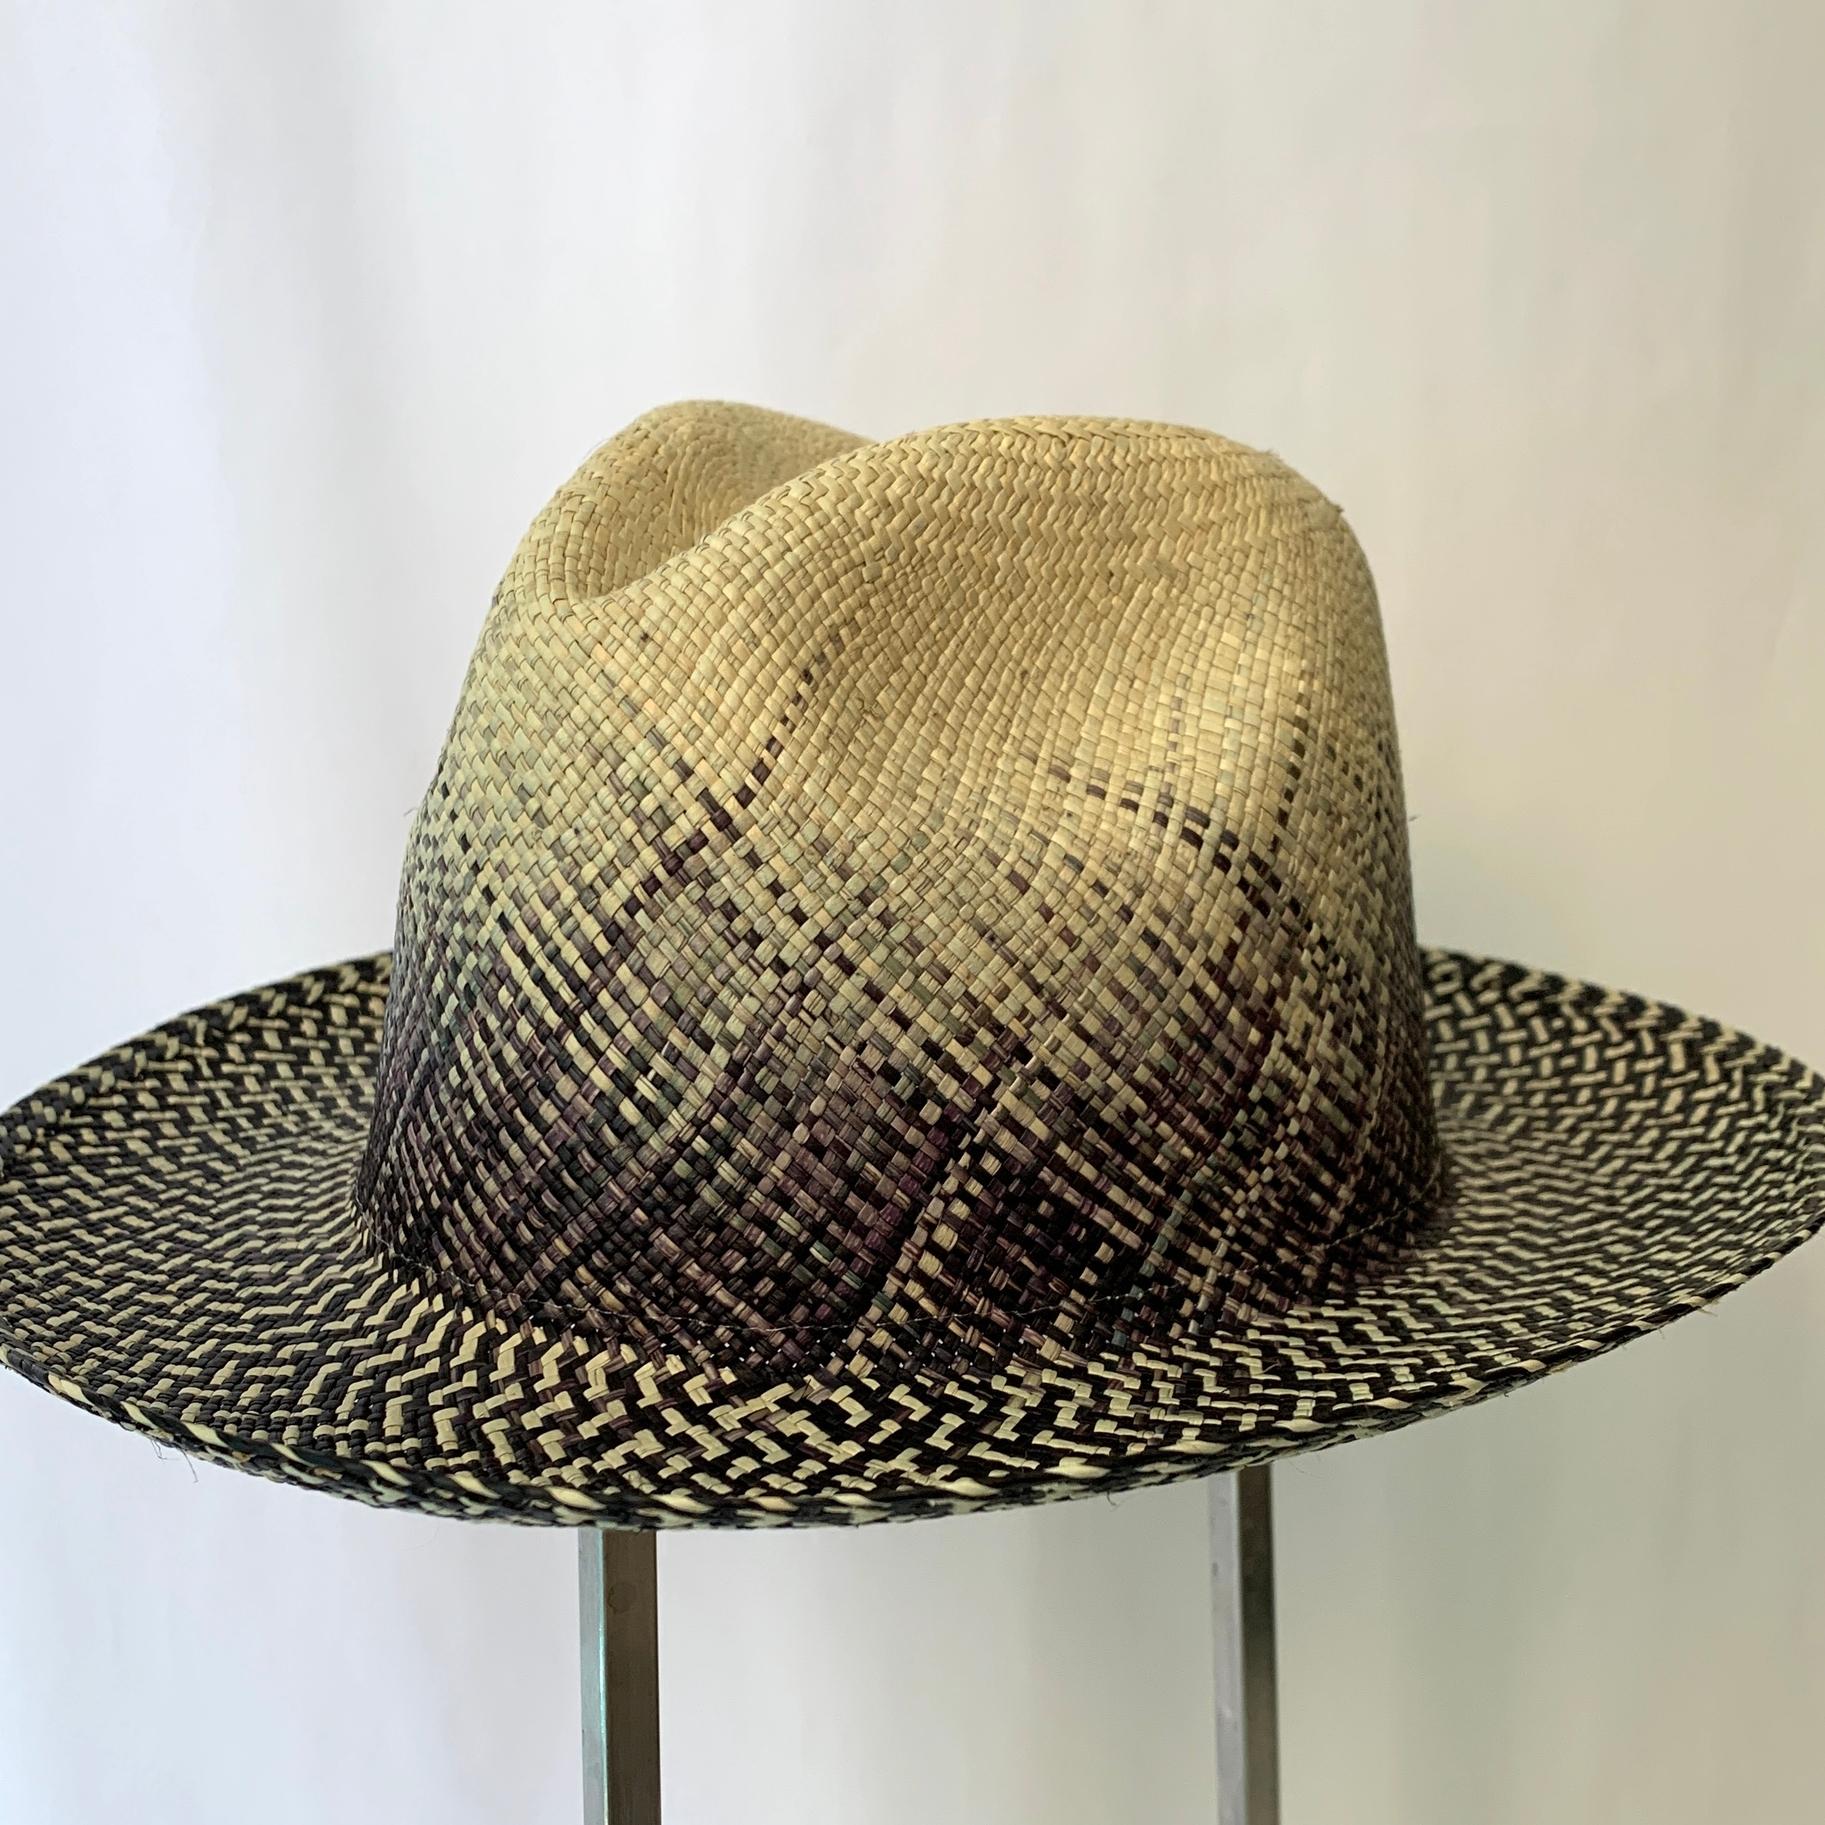 Lemloreli - Ombre Weave Hat - Natural/Navy | Trada Marketplace